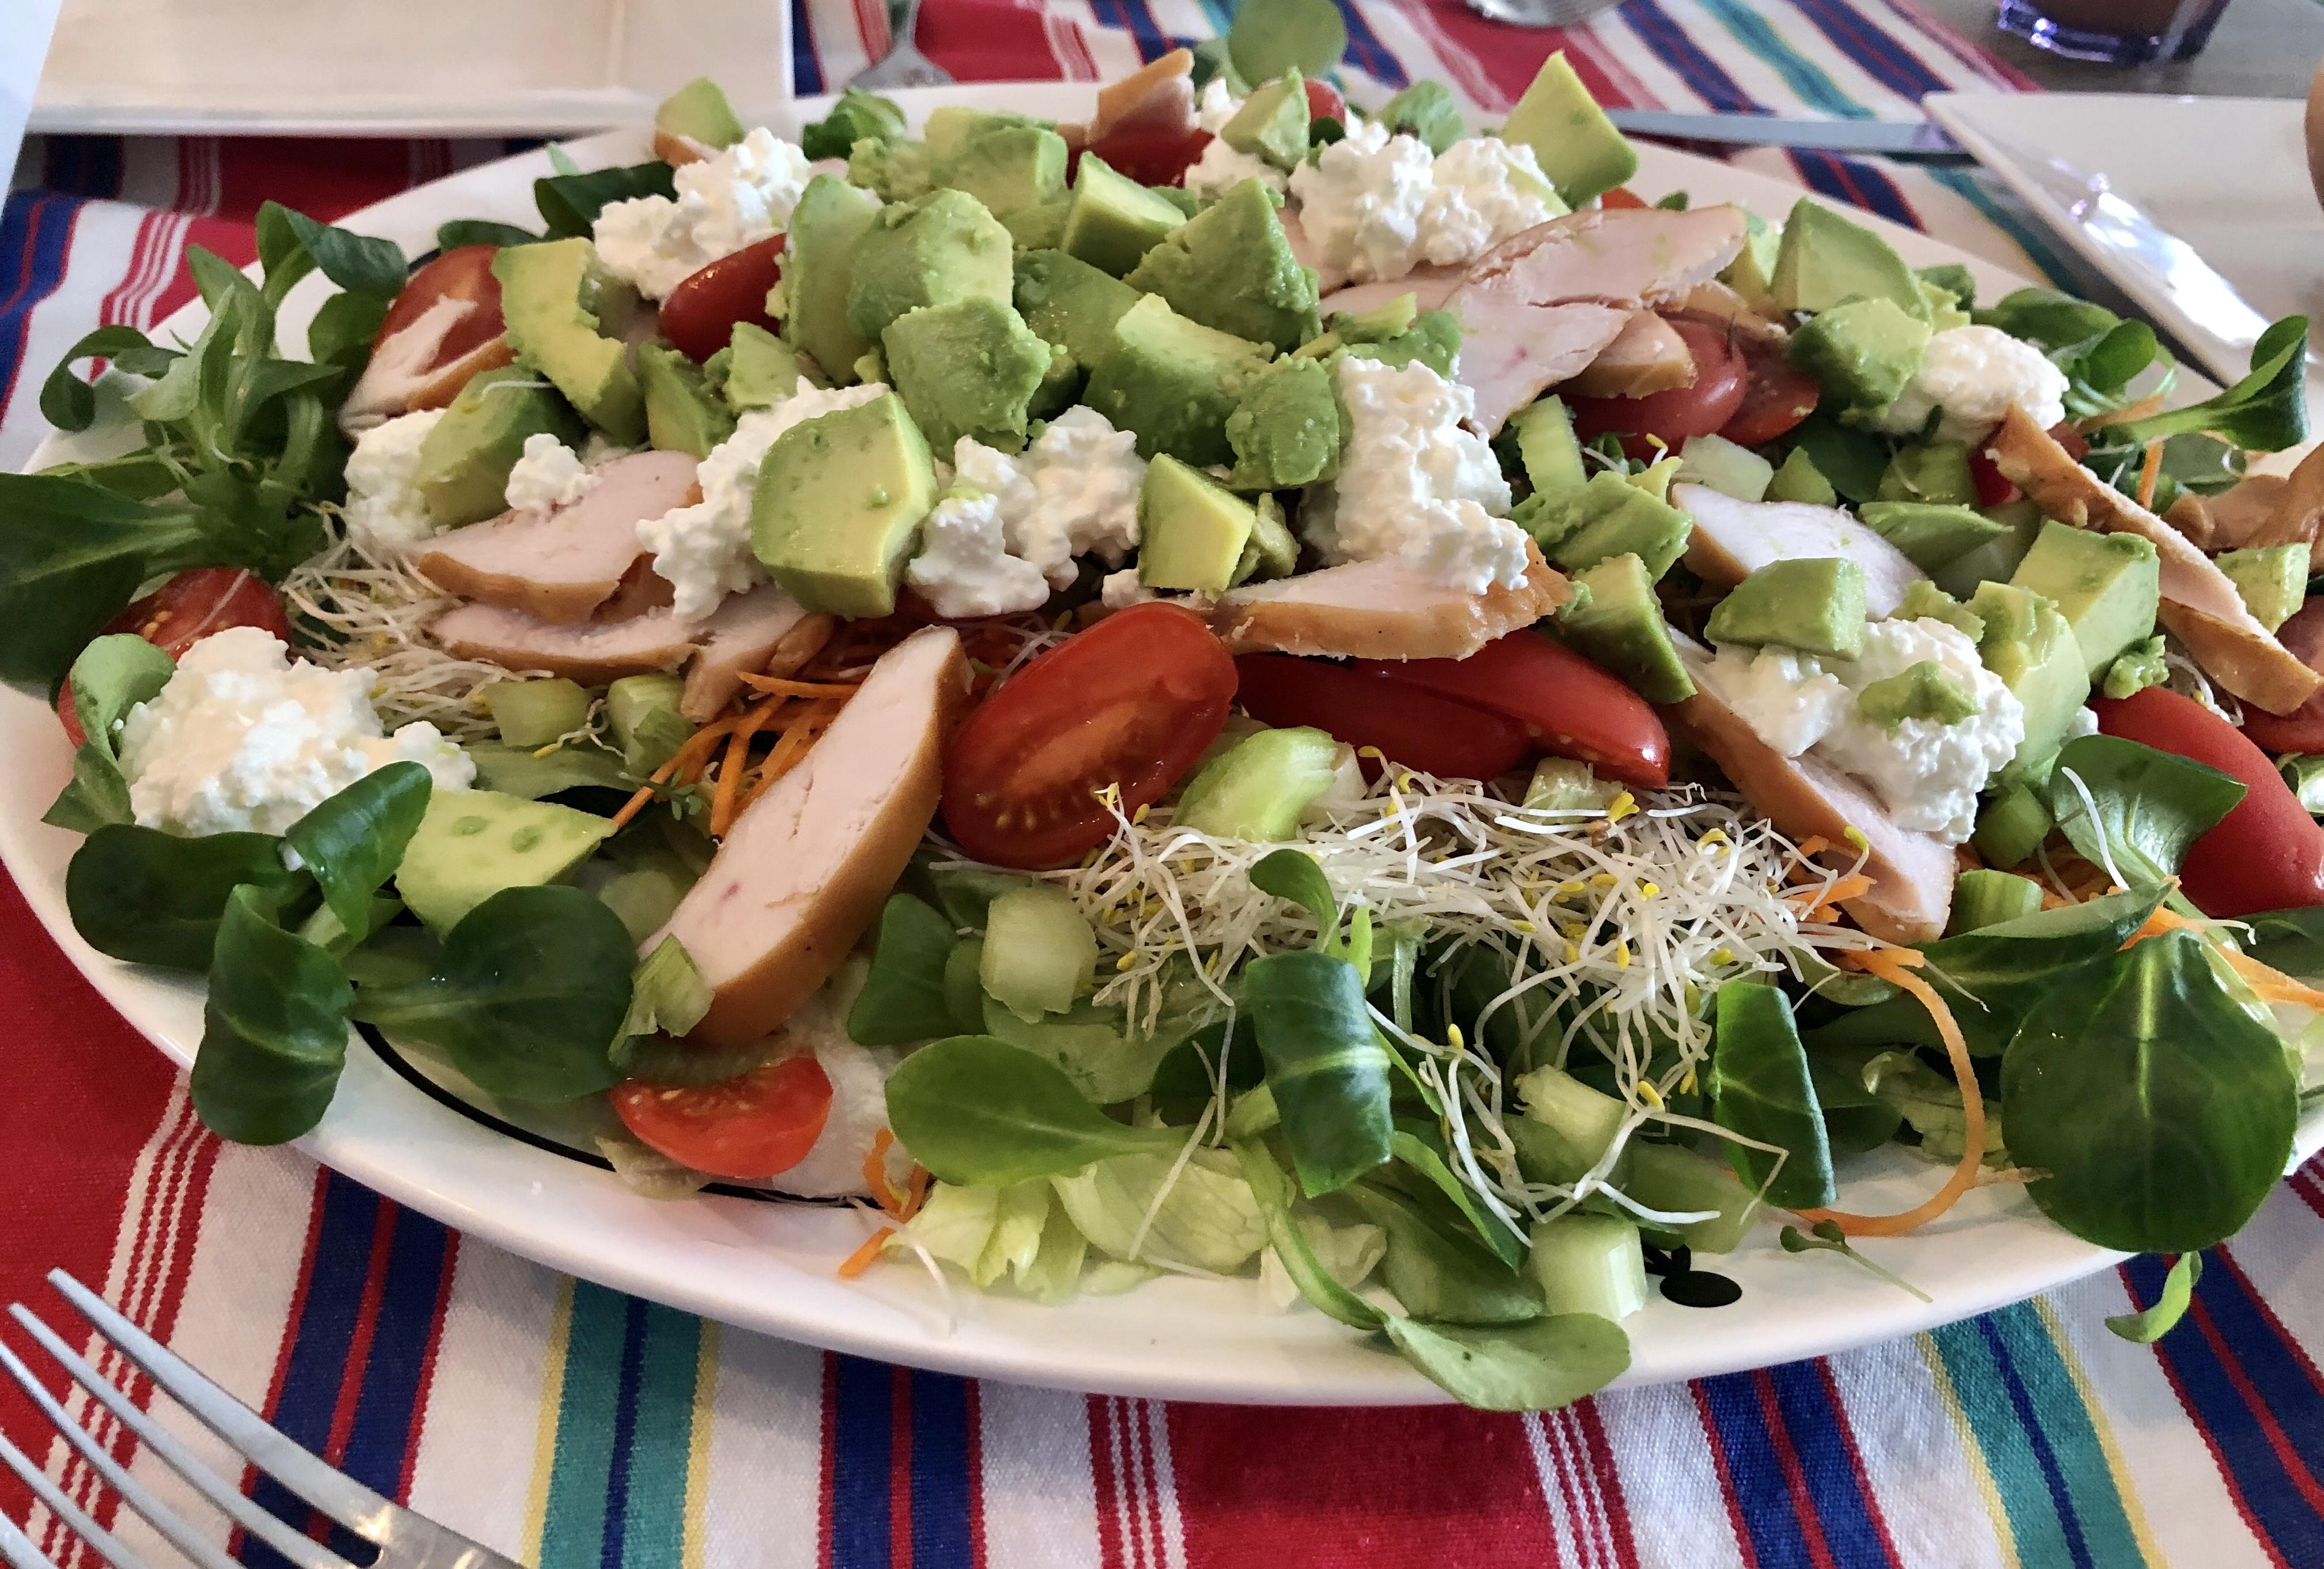 gezonde keuzes maken, biologisch eten, WW, weight watchers heruitgevonden